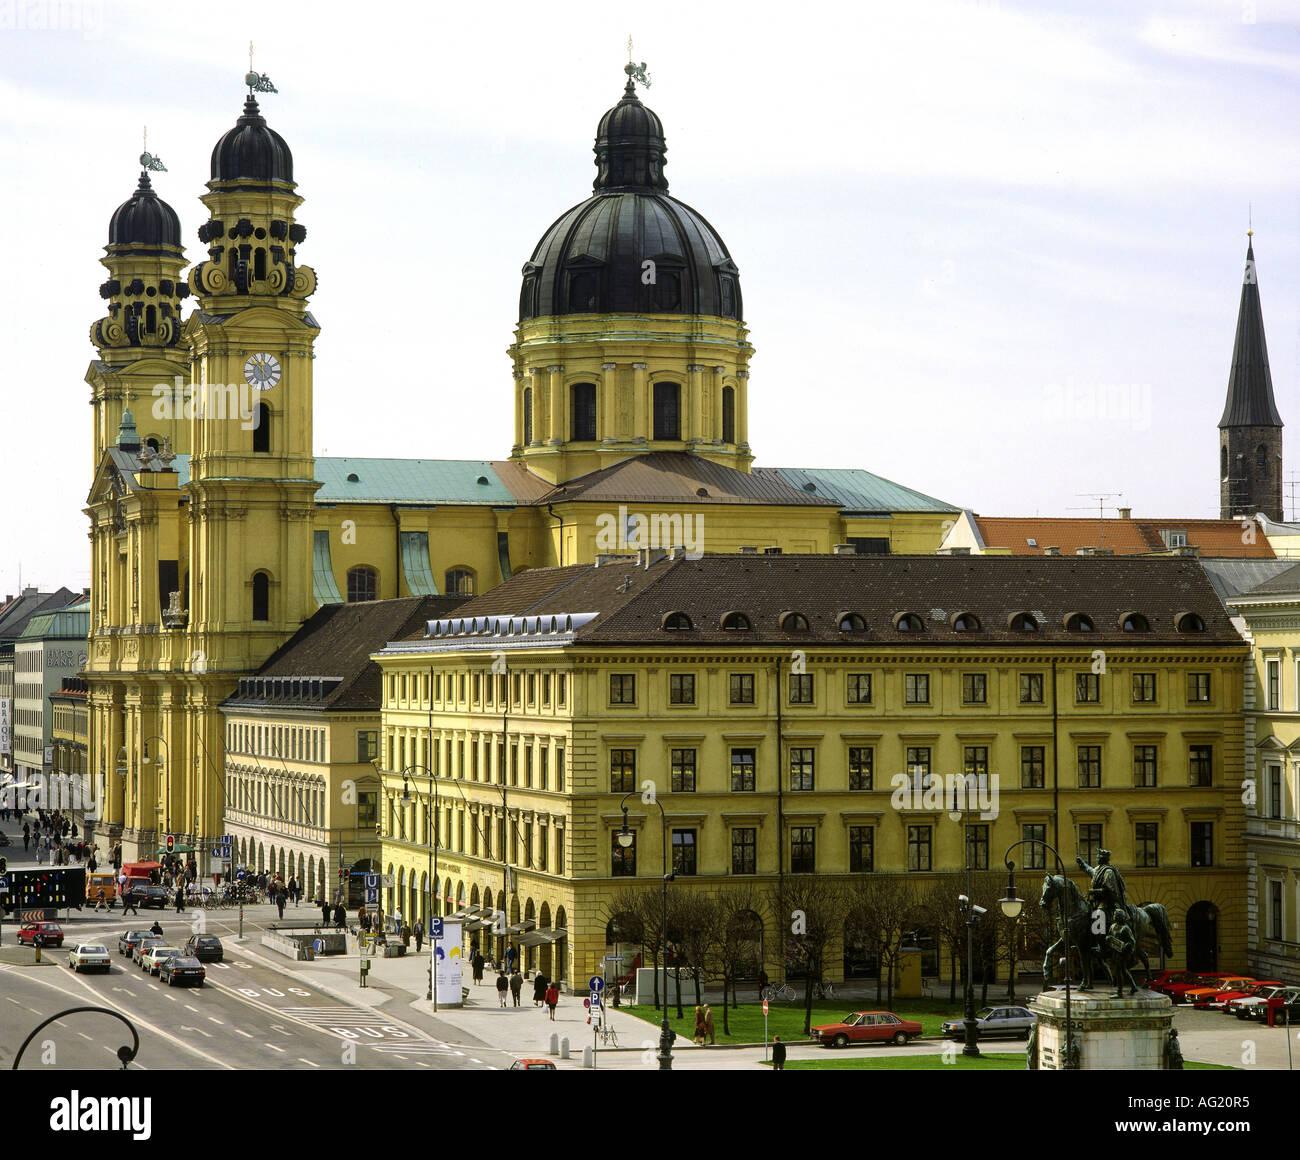 Geography Travel Germany Bavaria Munich Churches